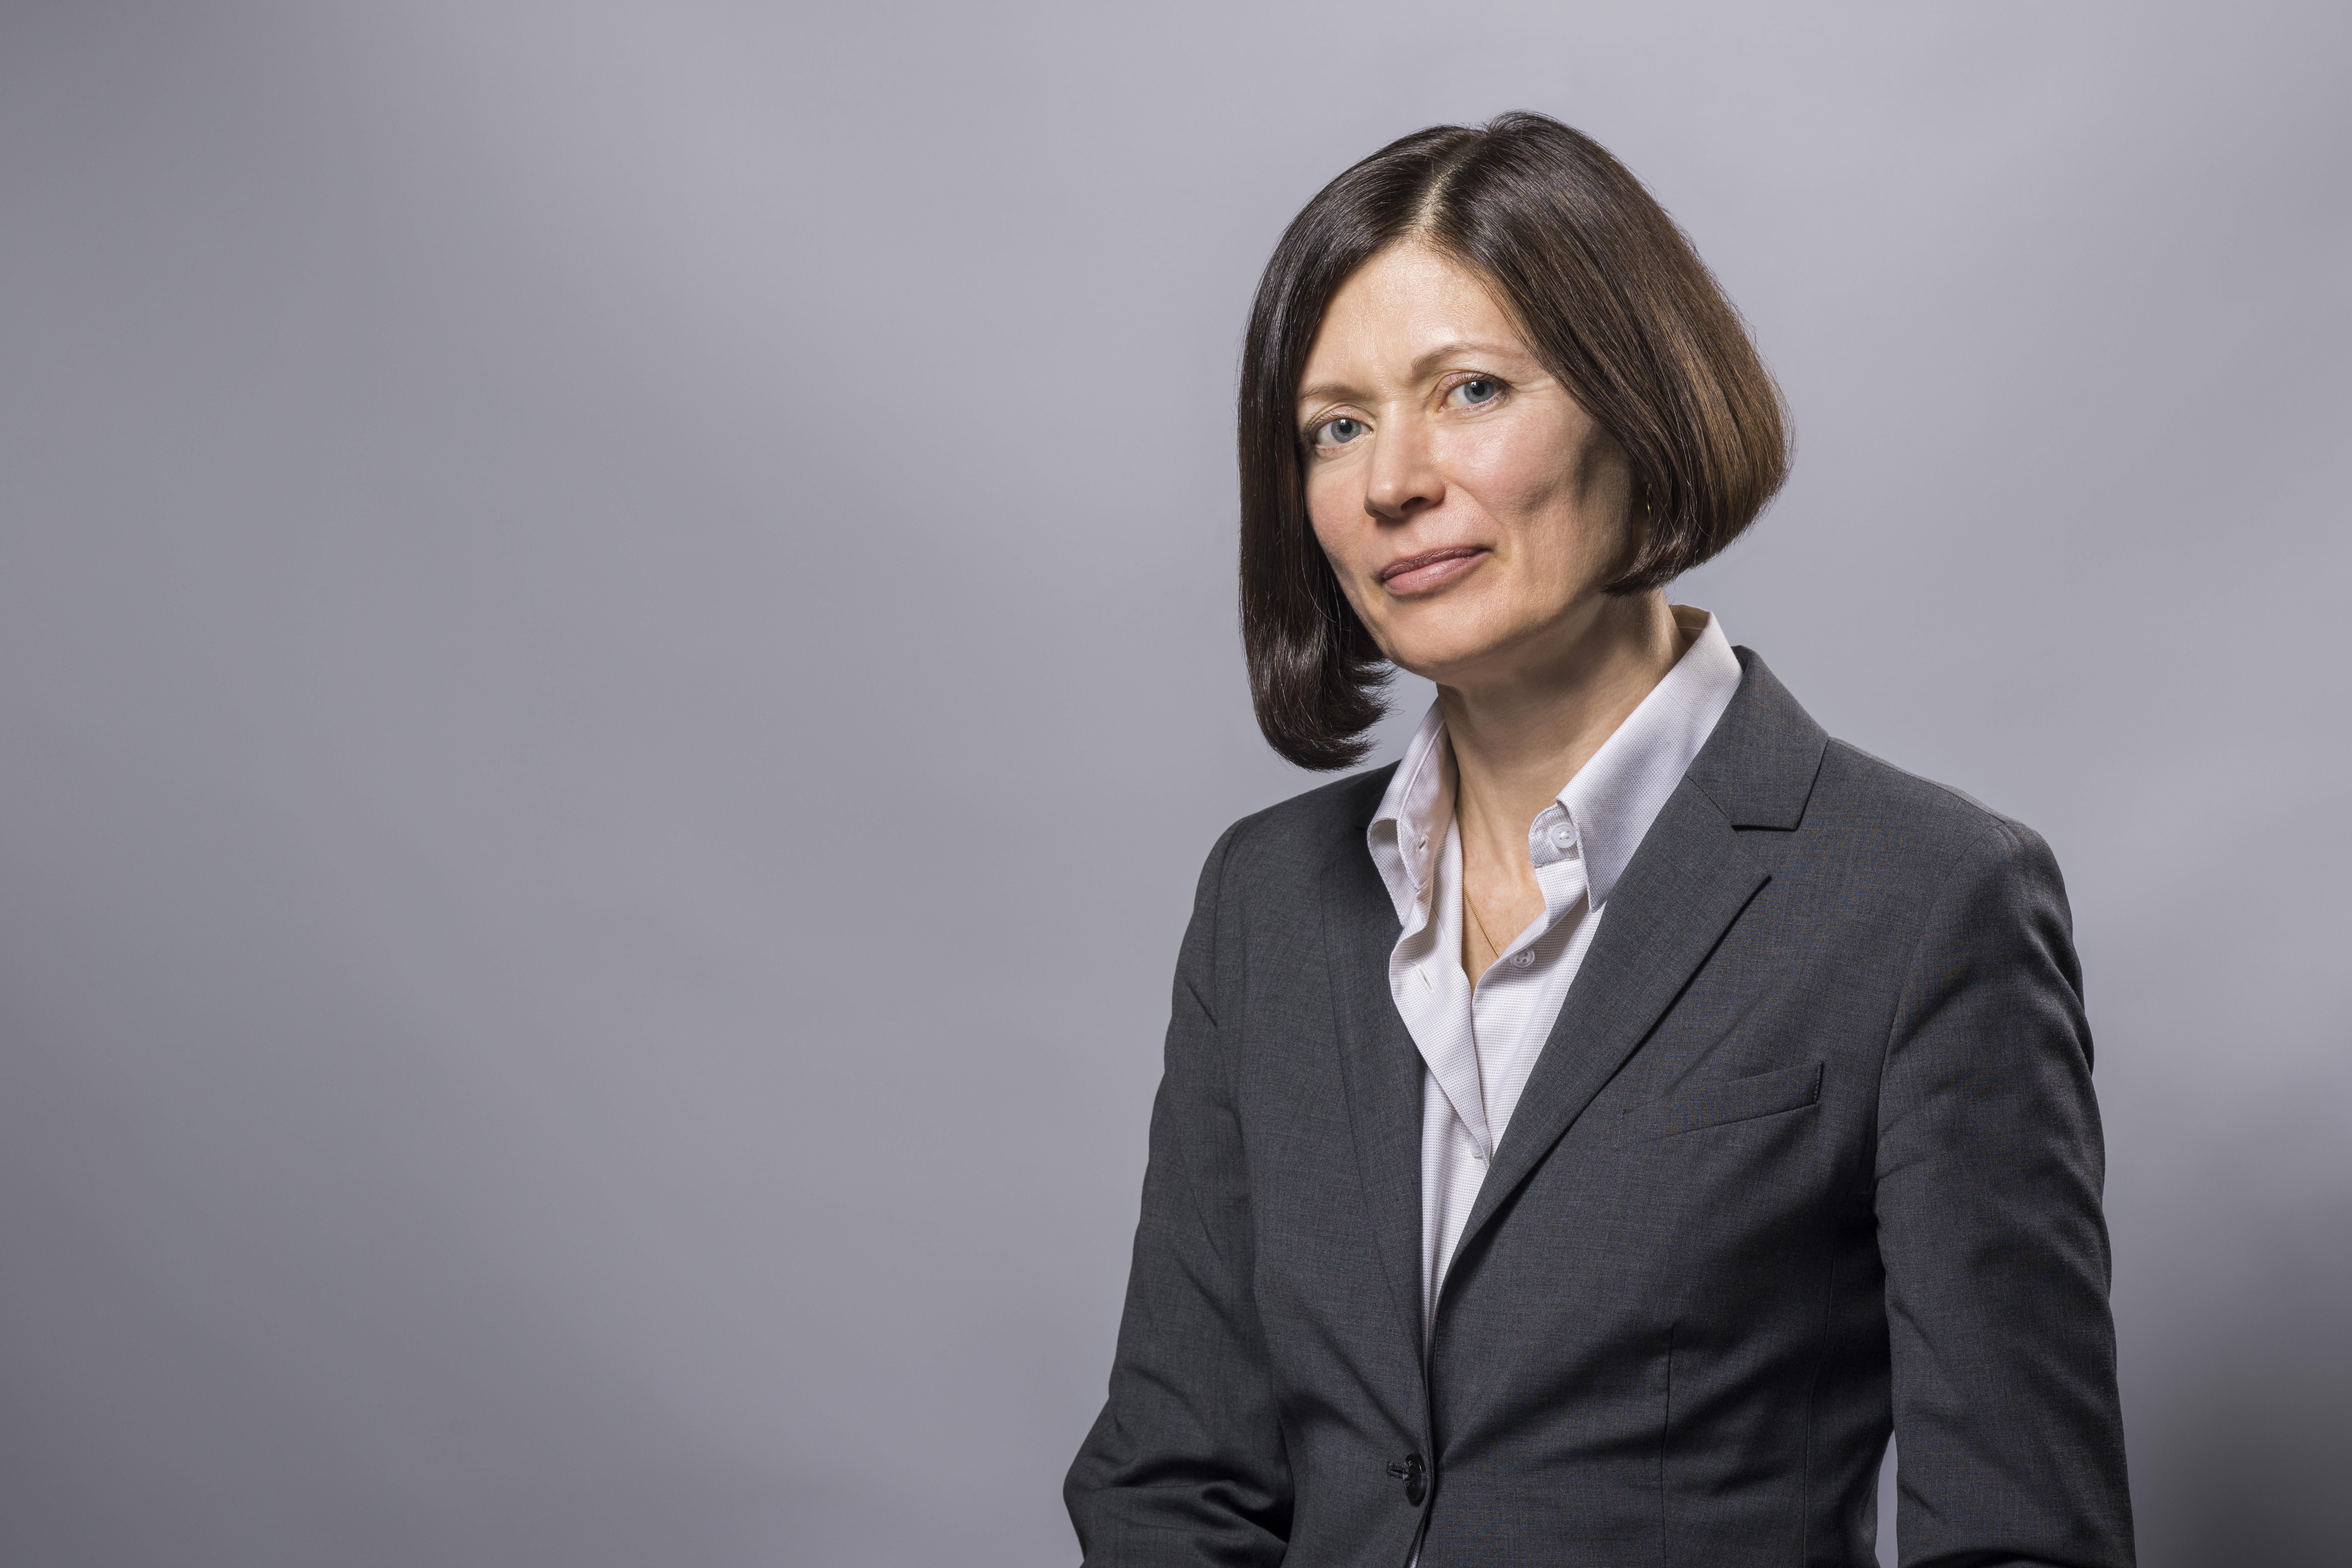 Gabriella Sebardt